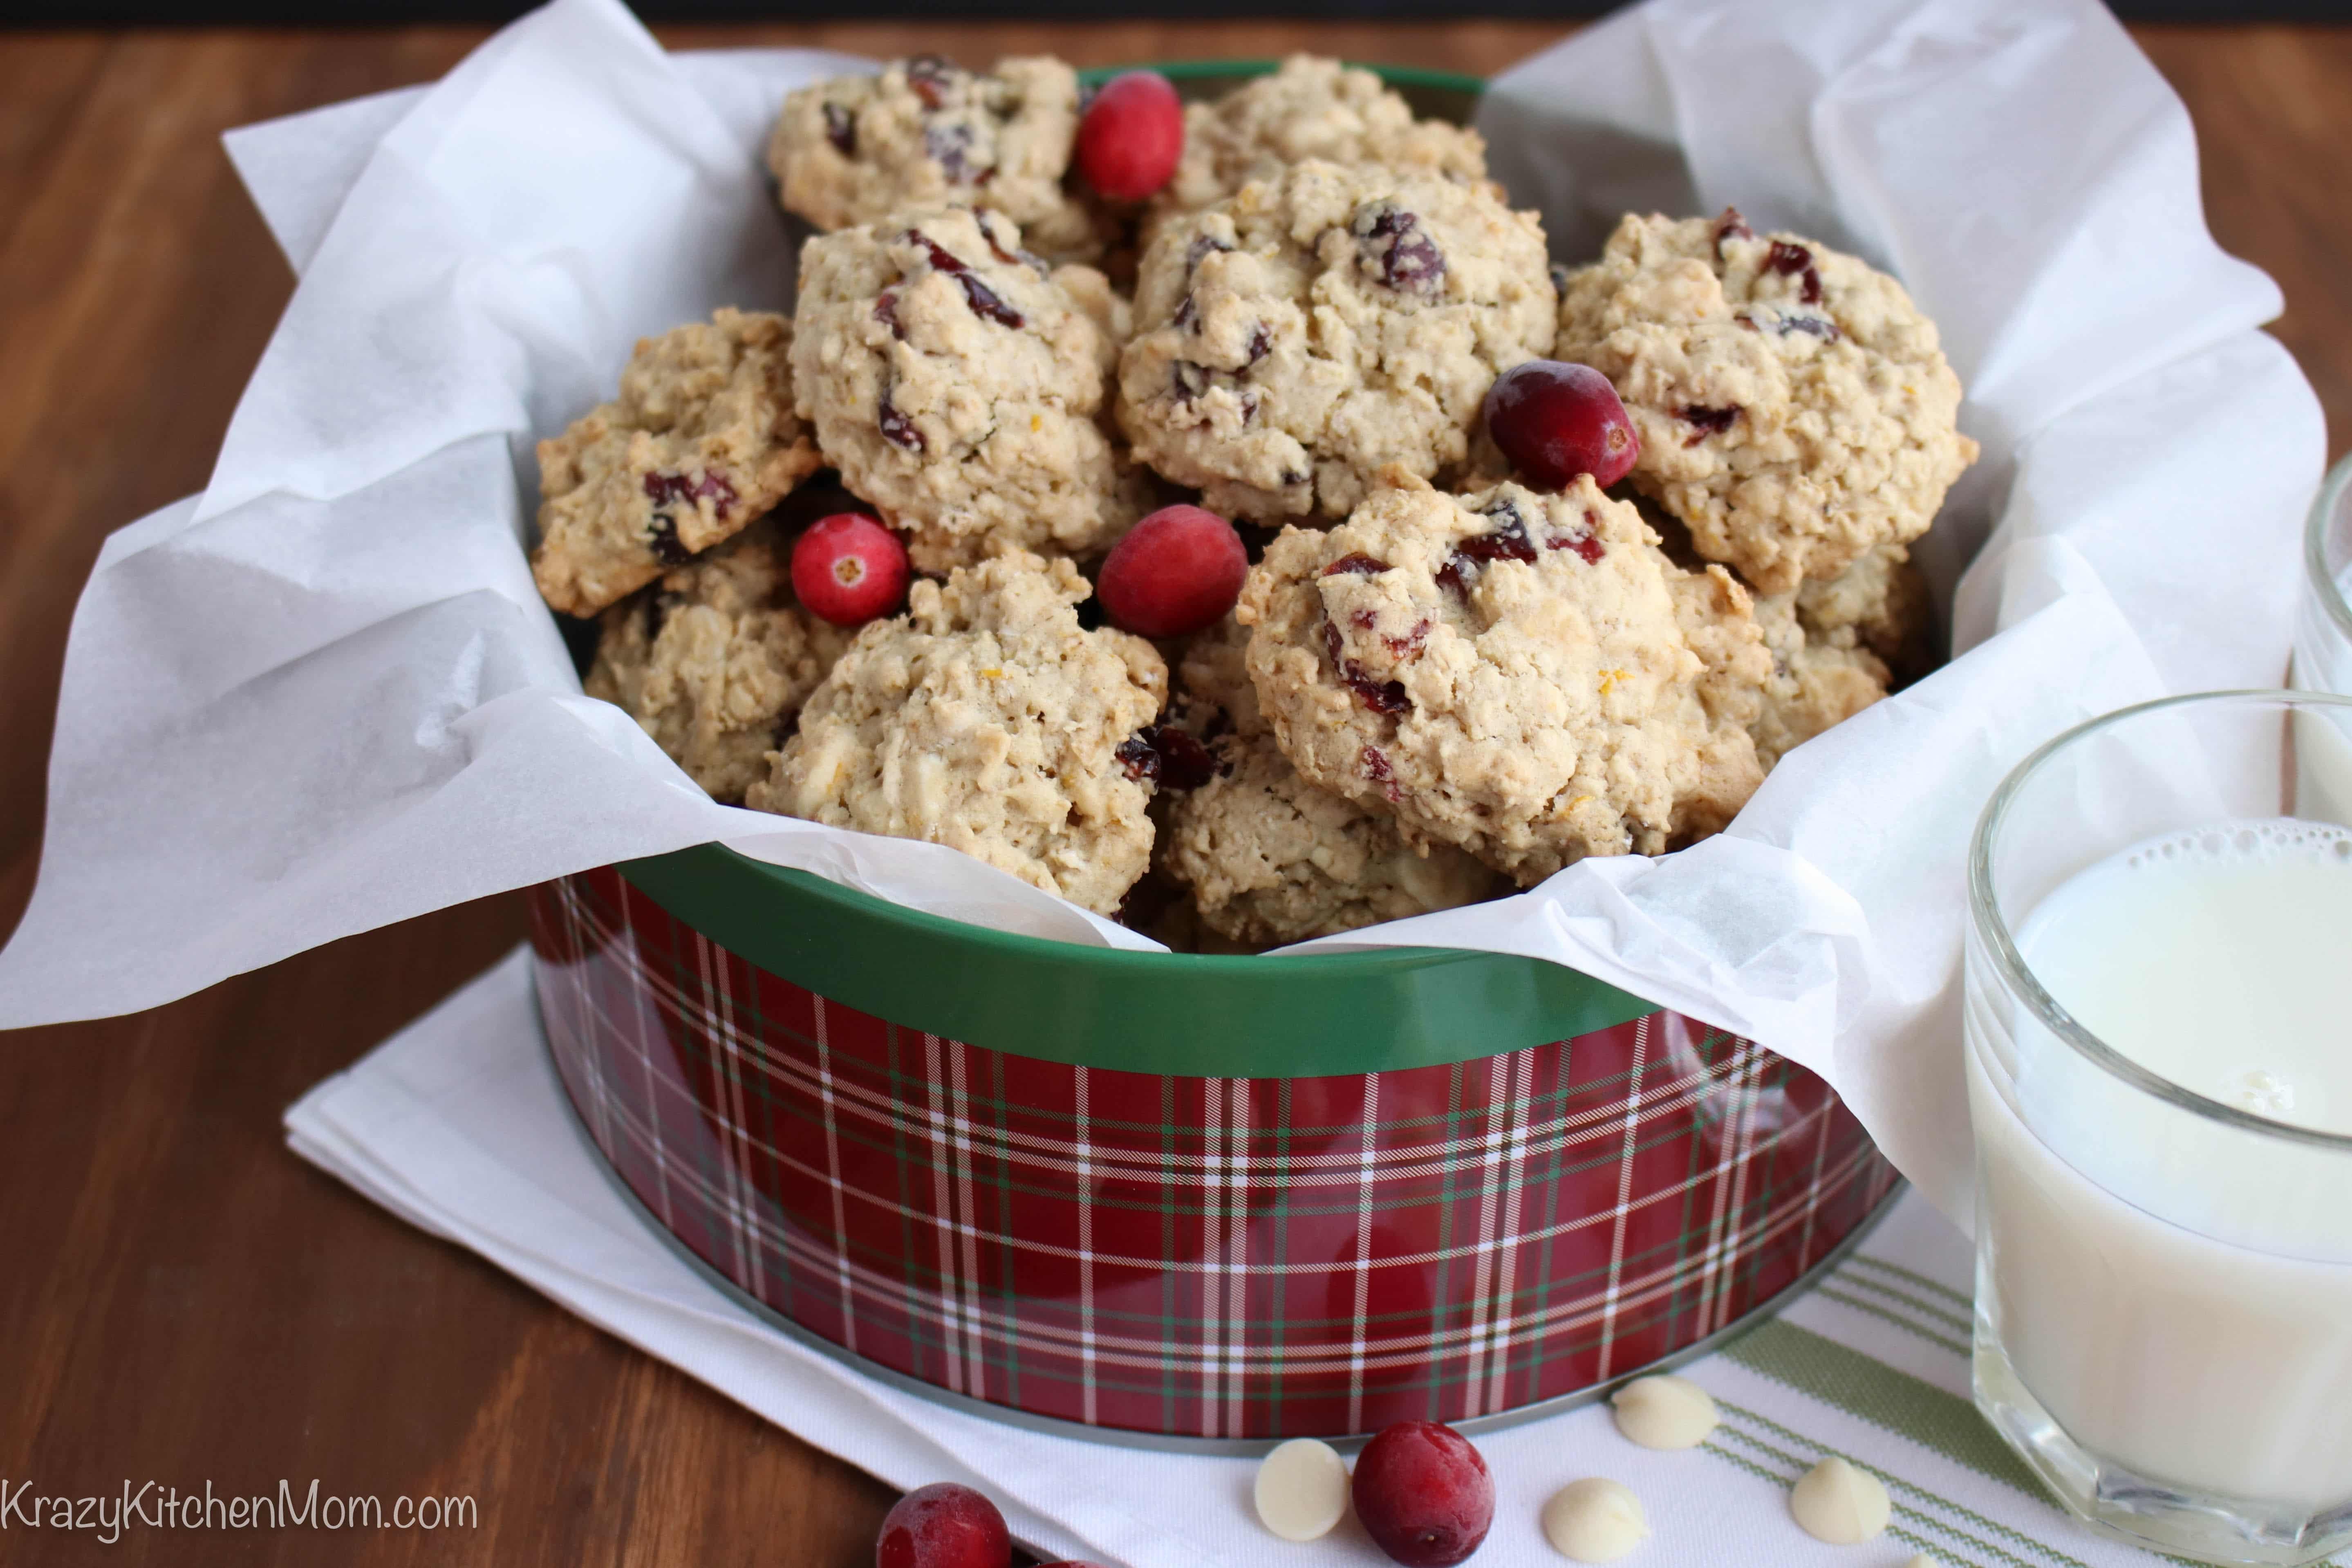 Orange Cranberry Oatmeal Cookies